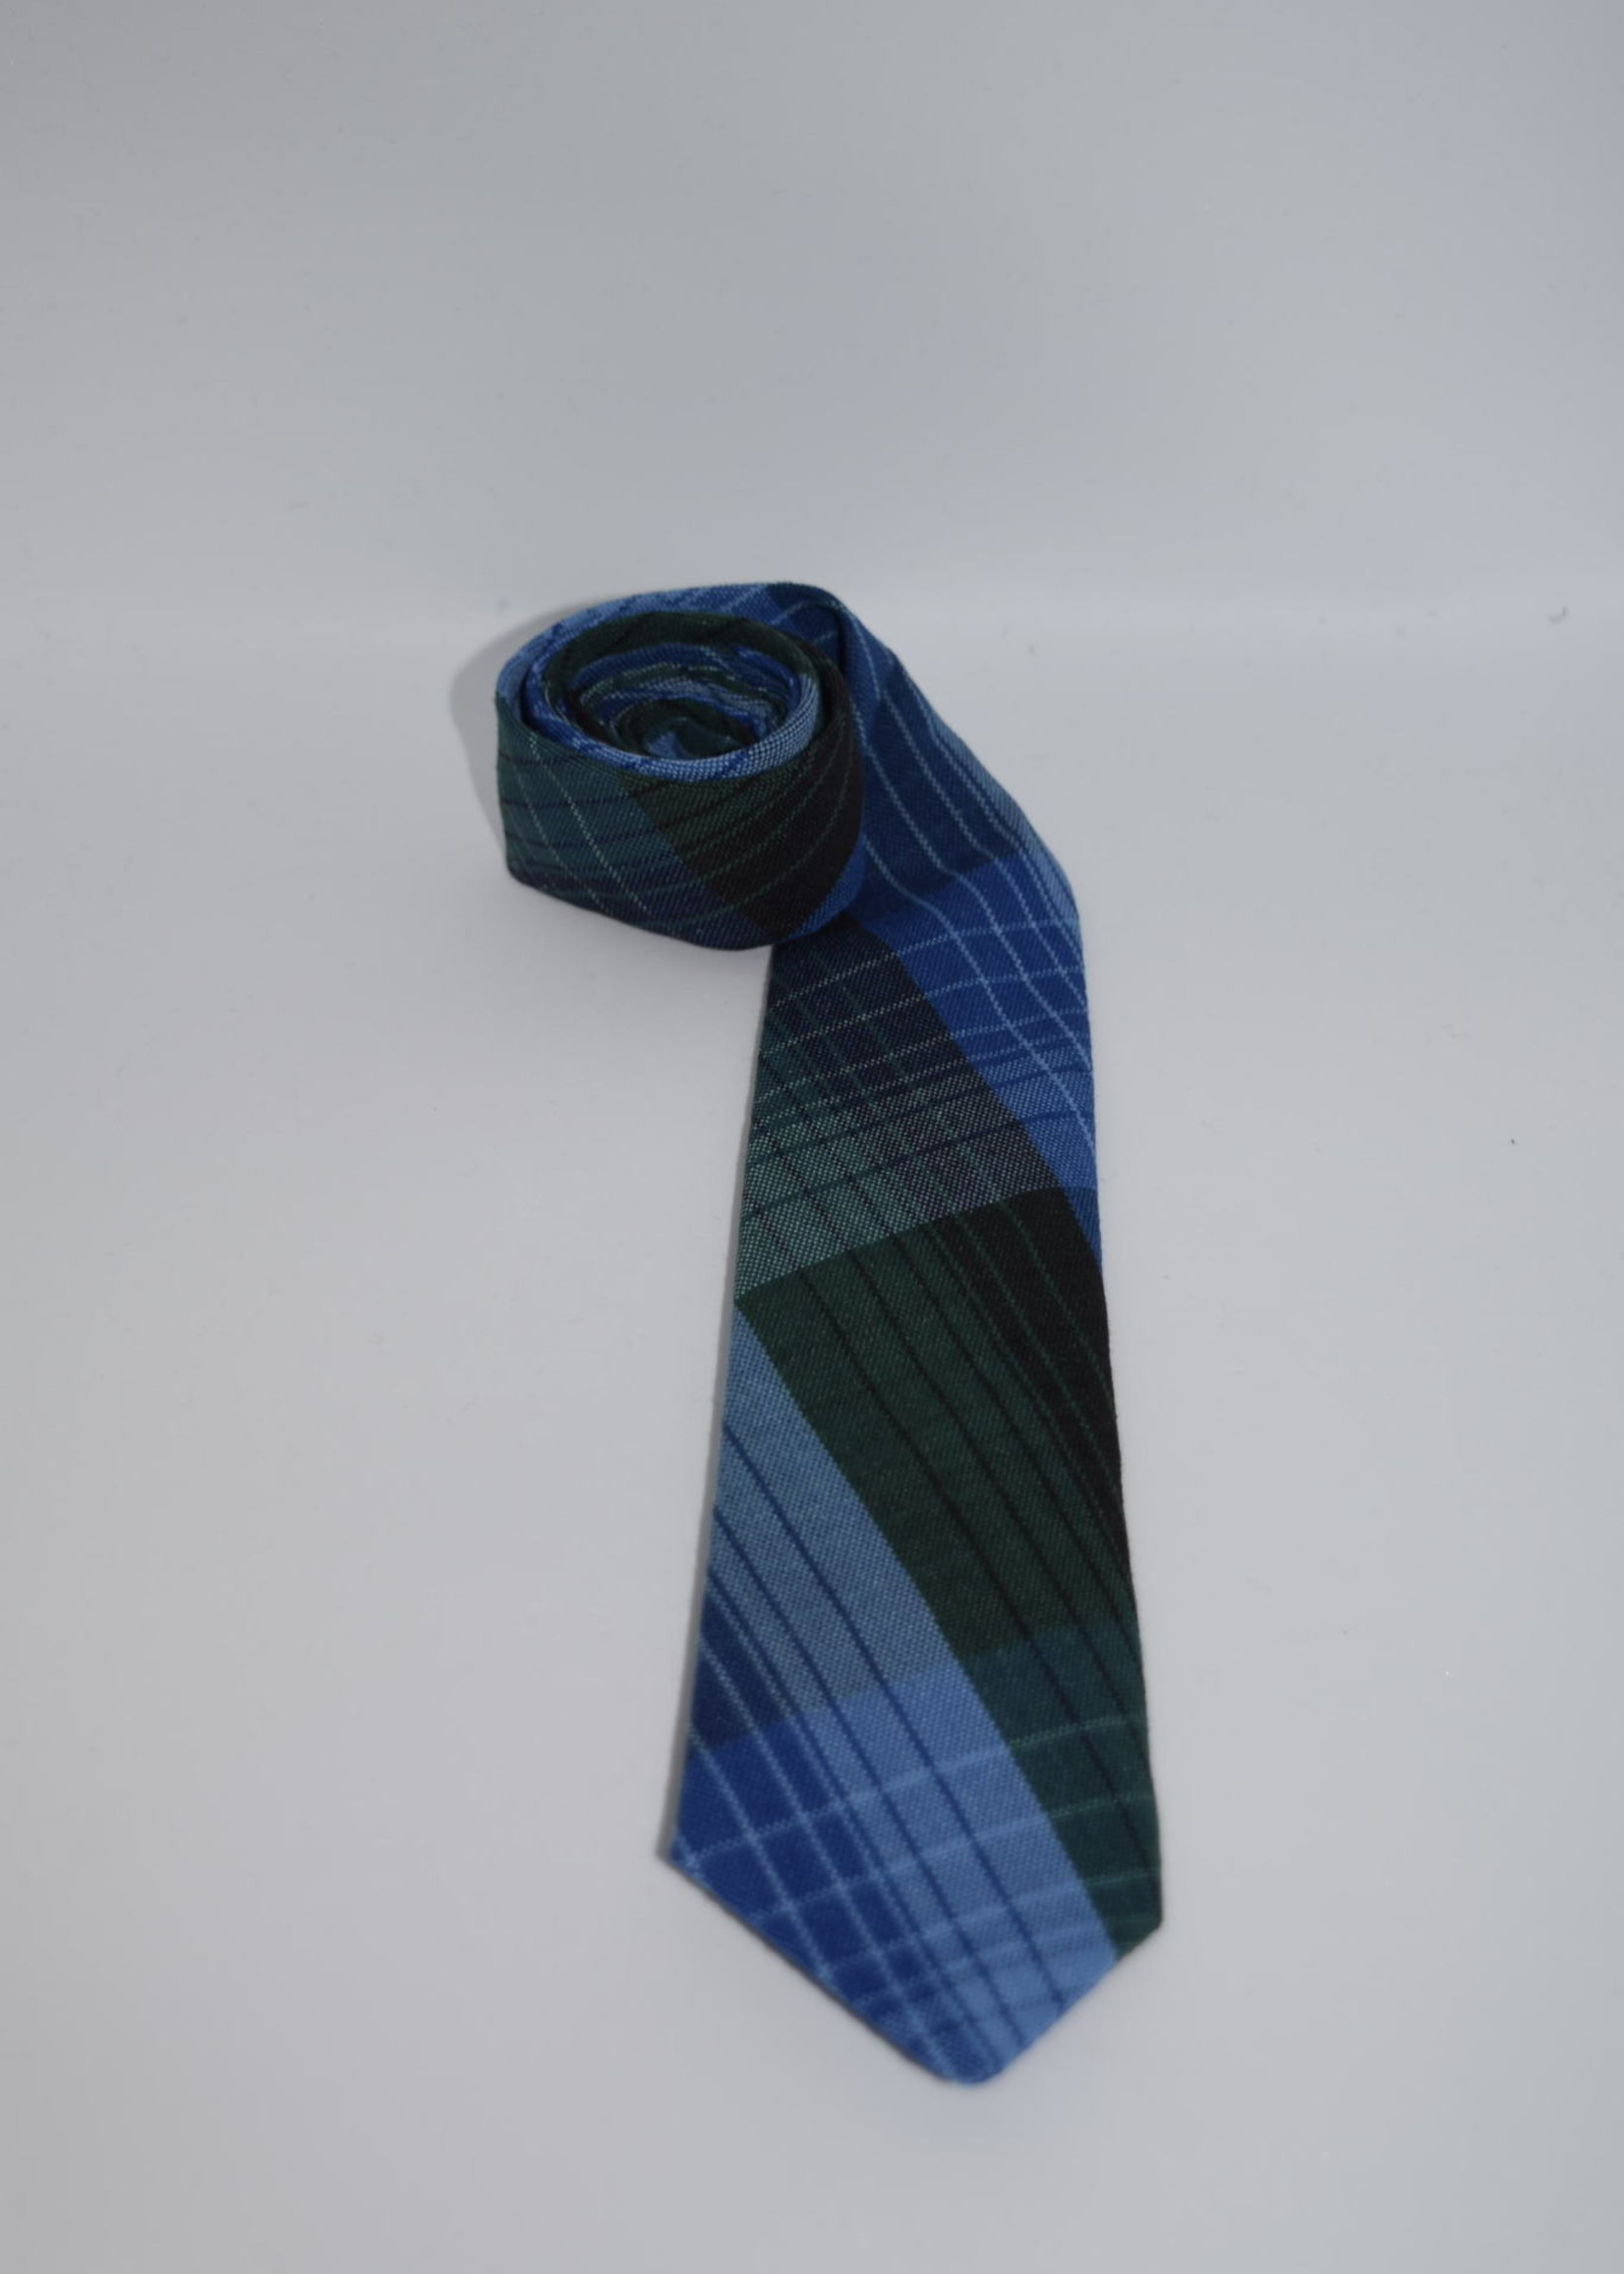 EDT Plaid 4 in hand Neck Tie -  P46